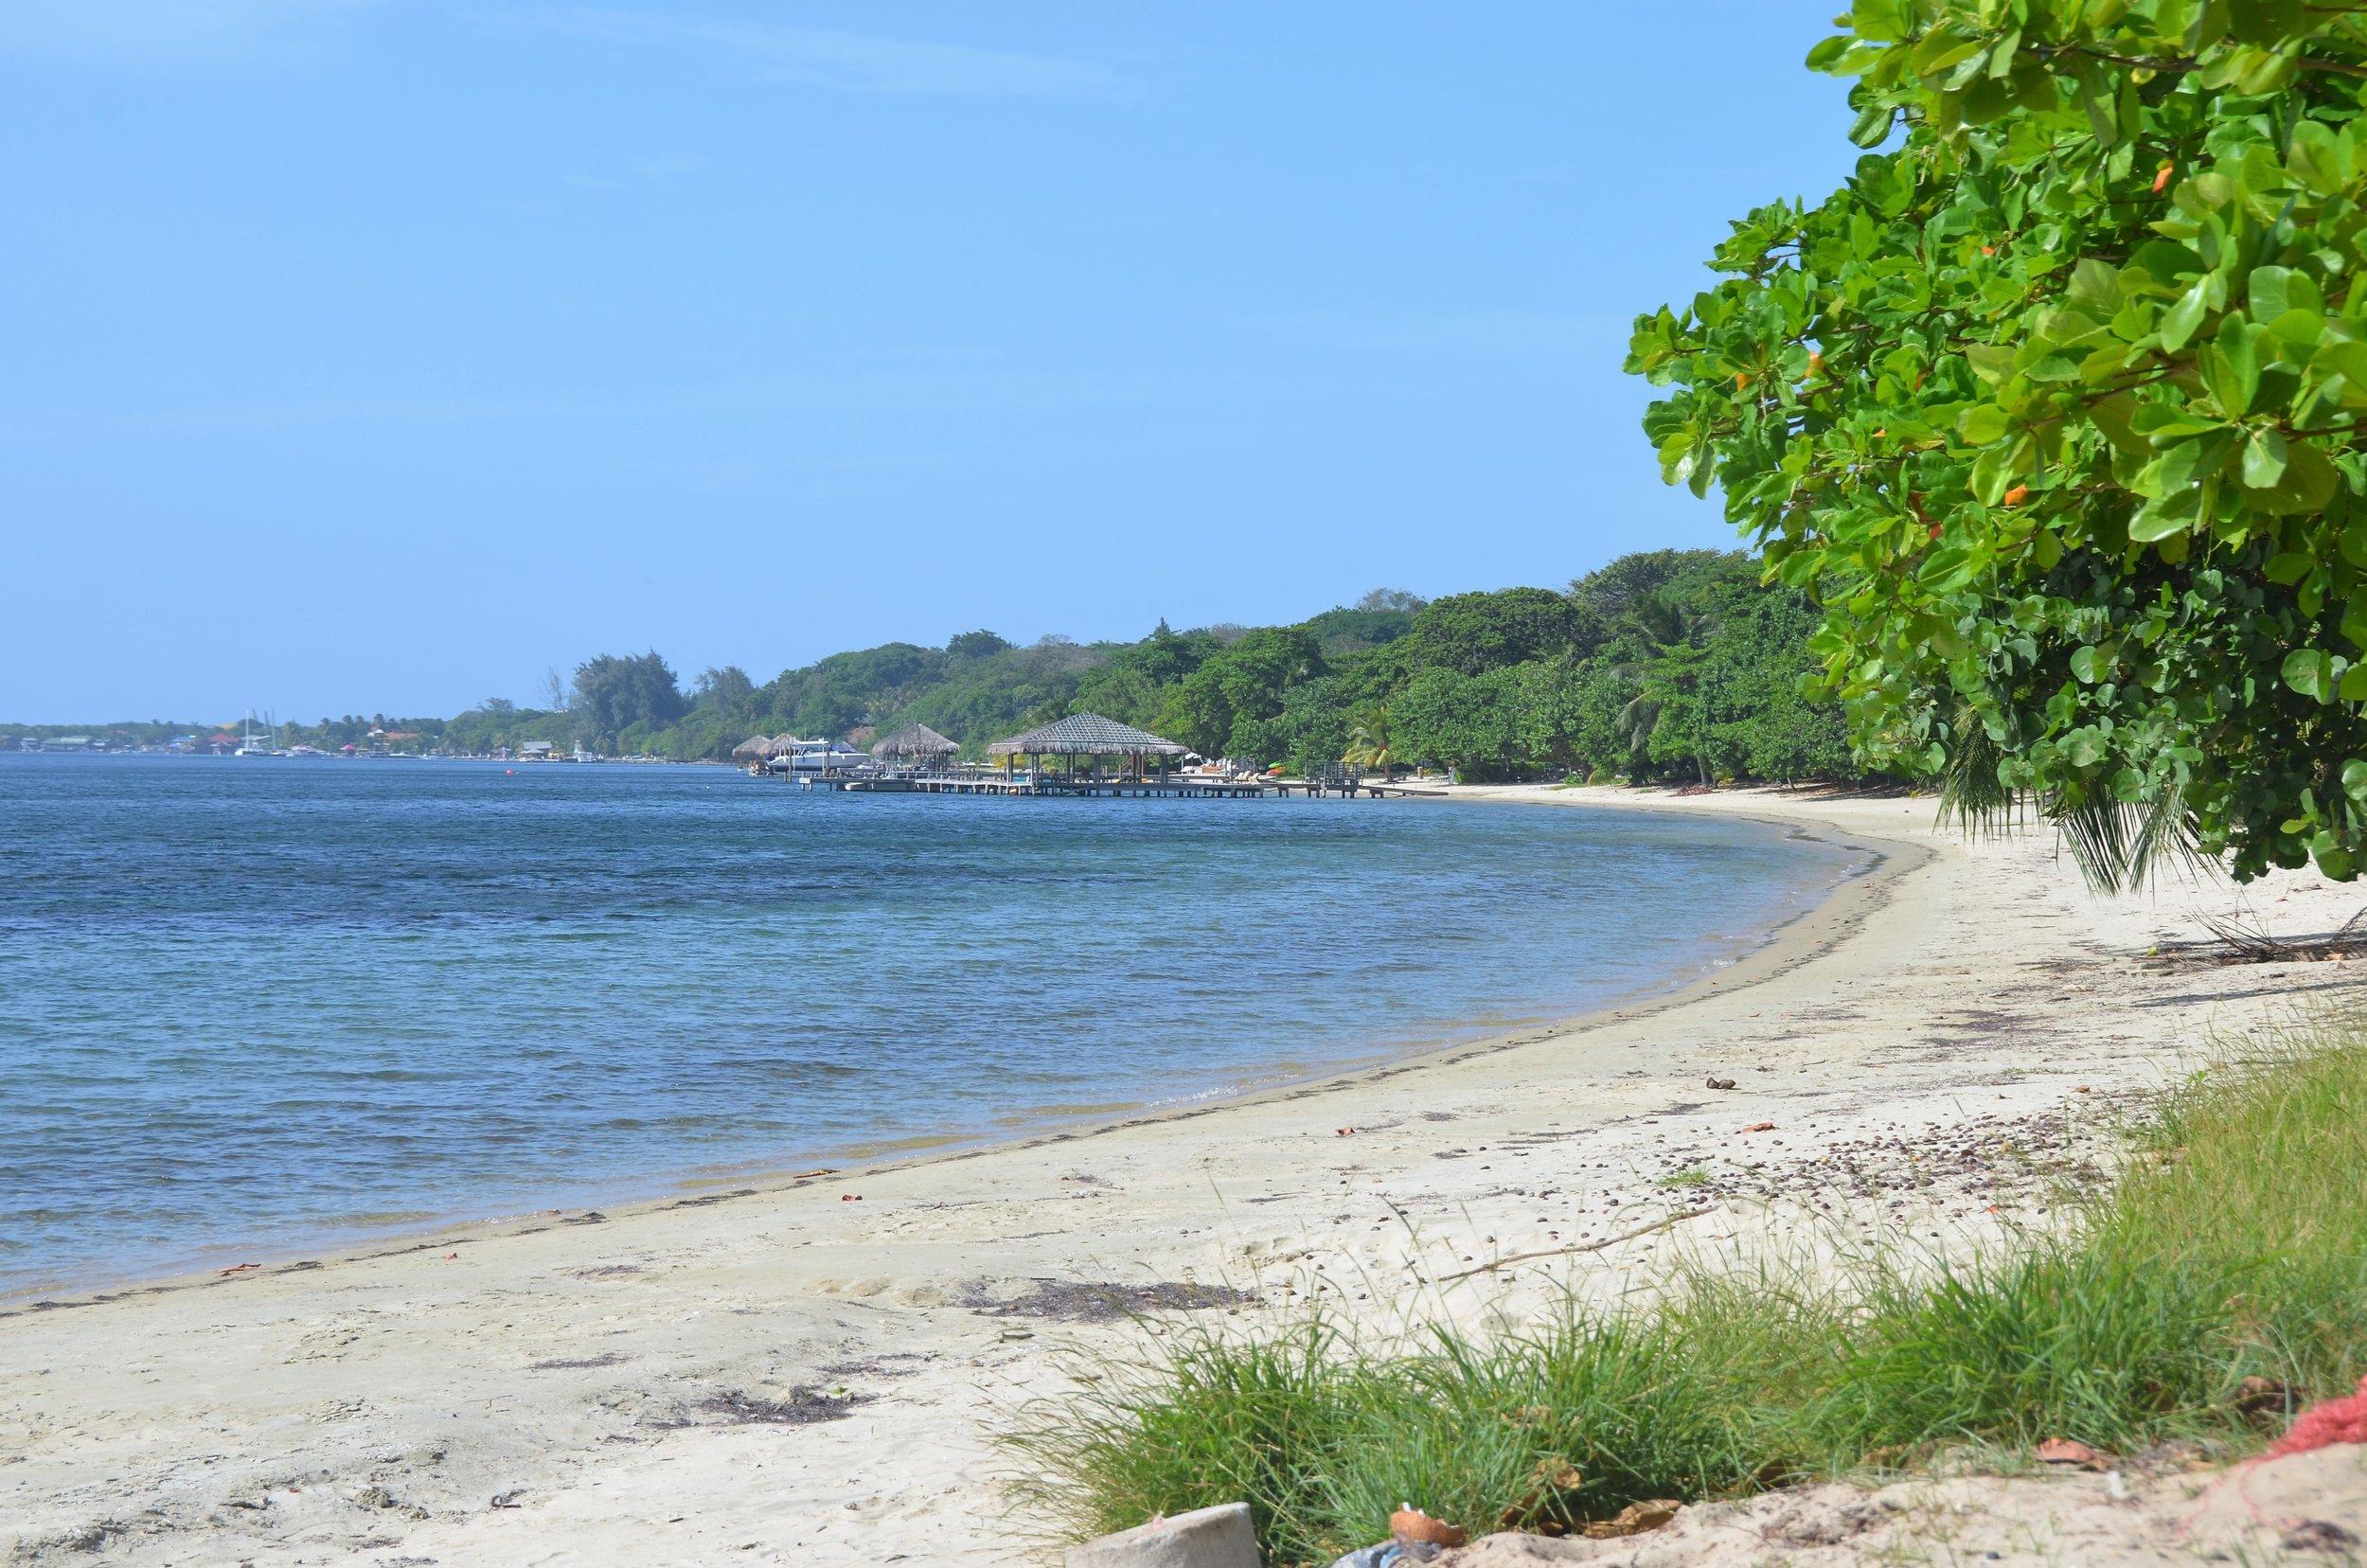 Tabyana Beach, Gumbalimba Preserve